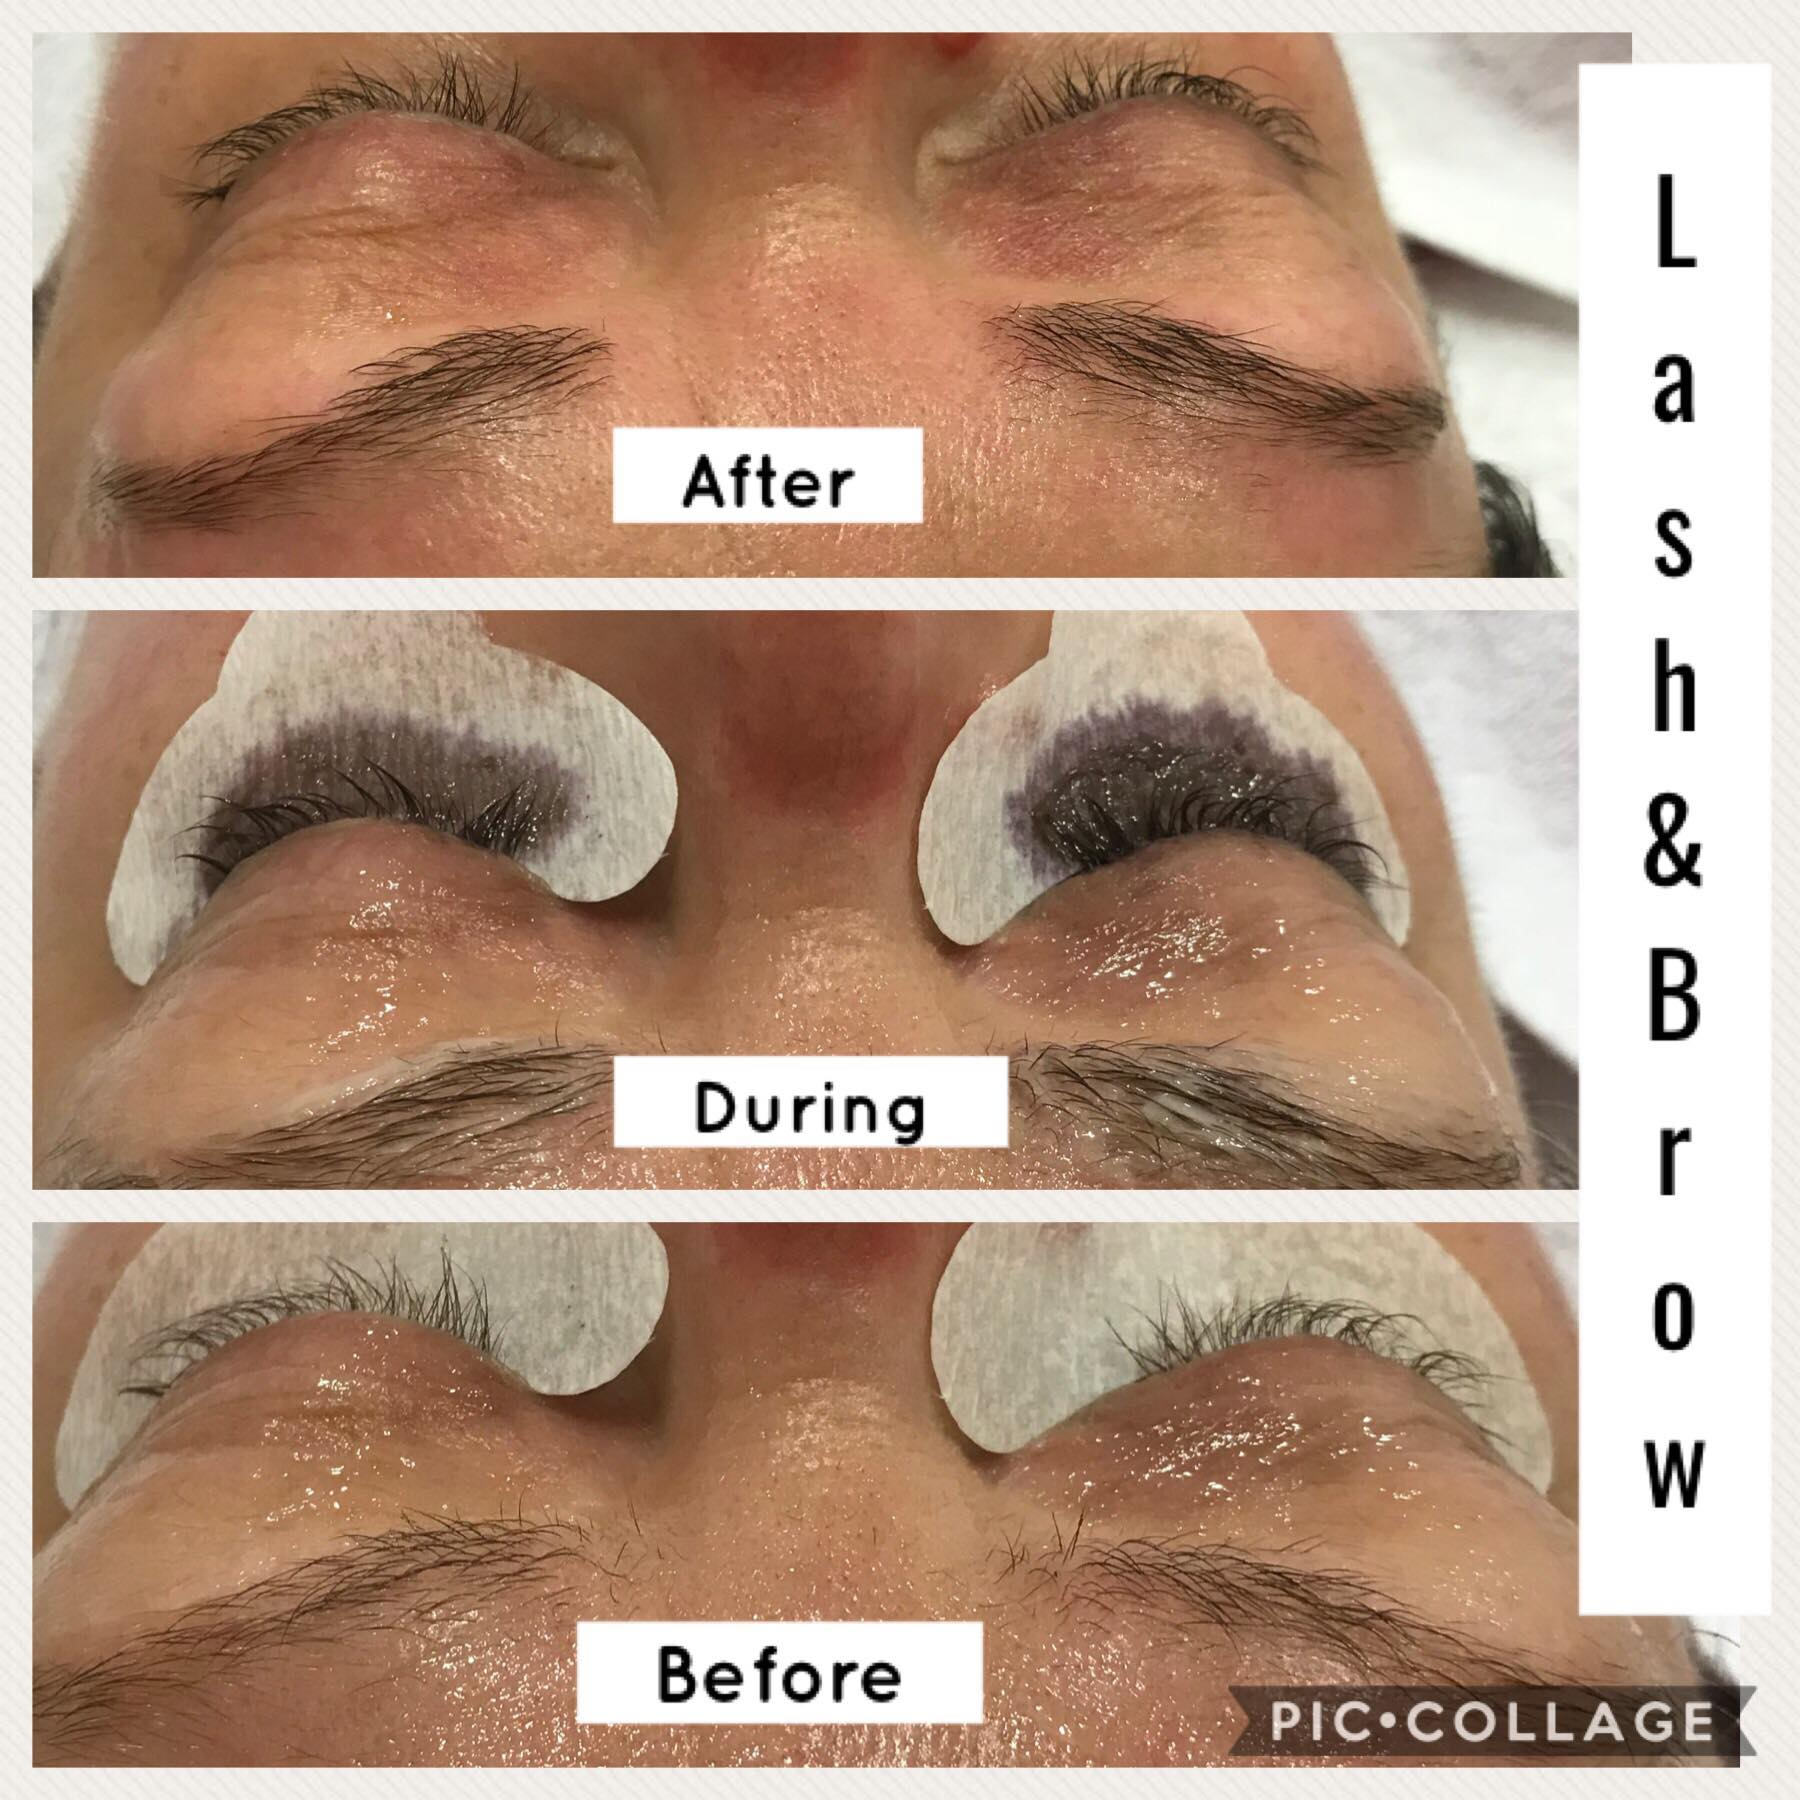 Lash and brow tinting